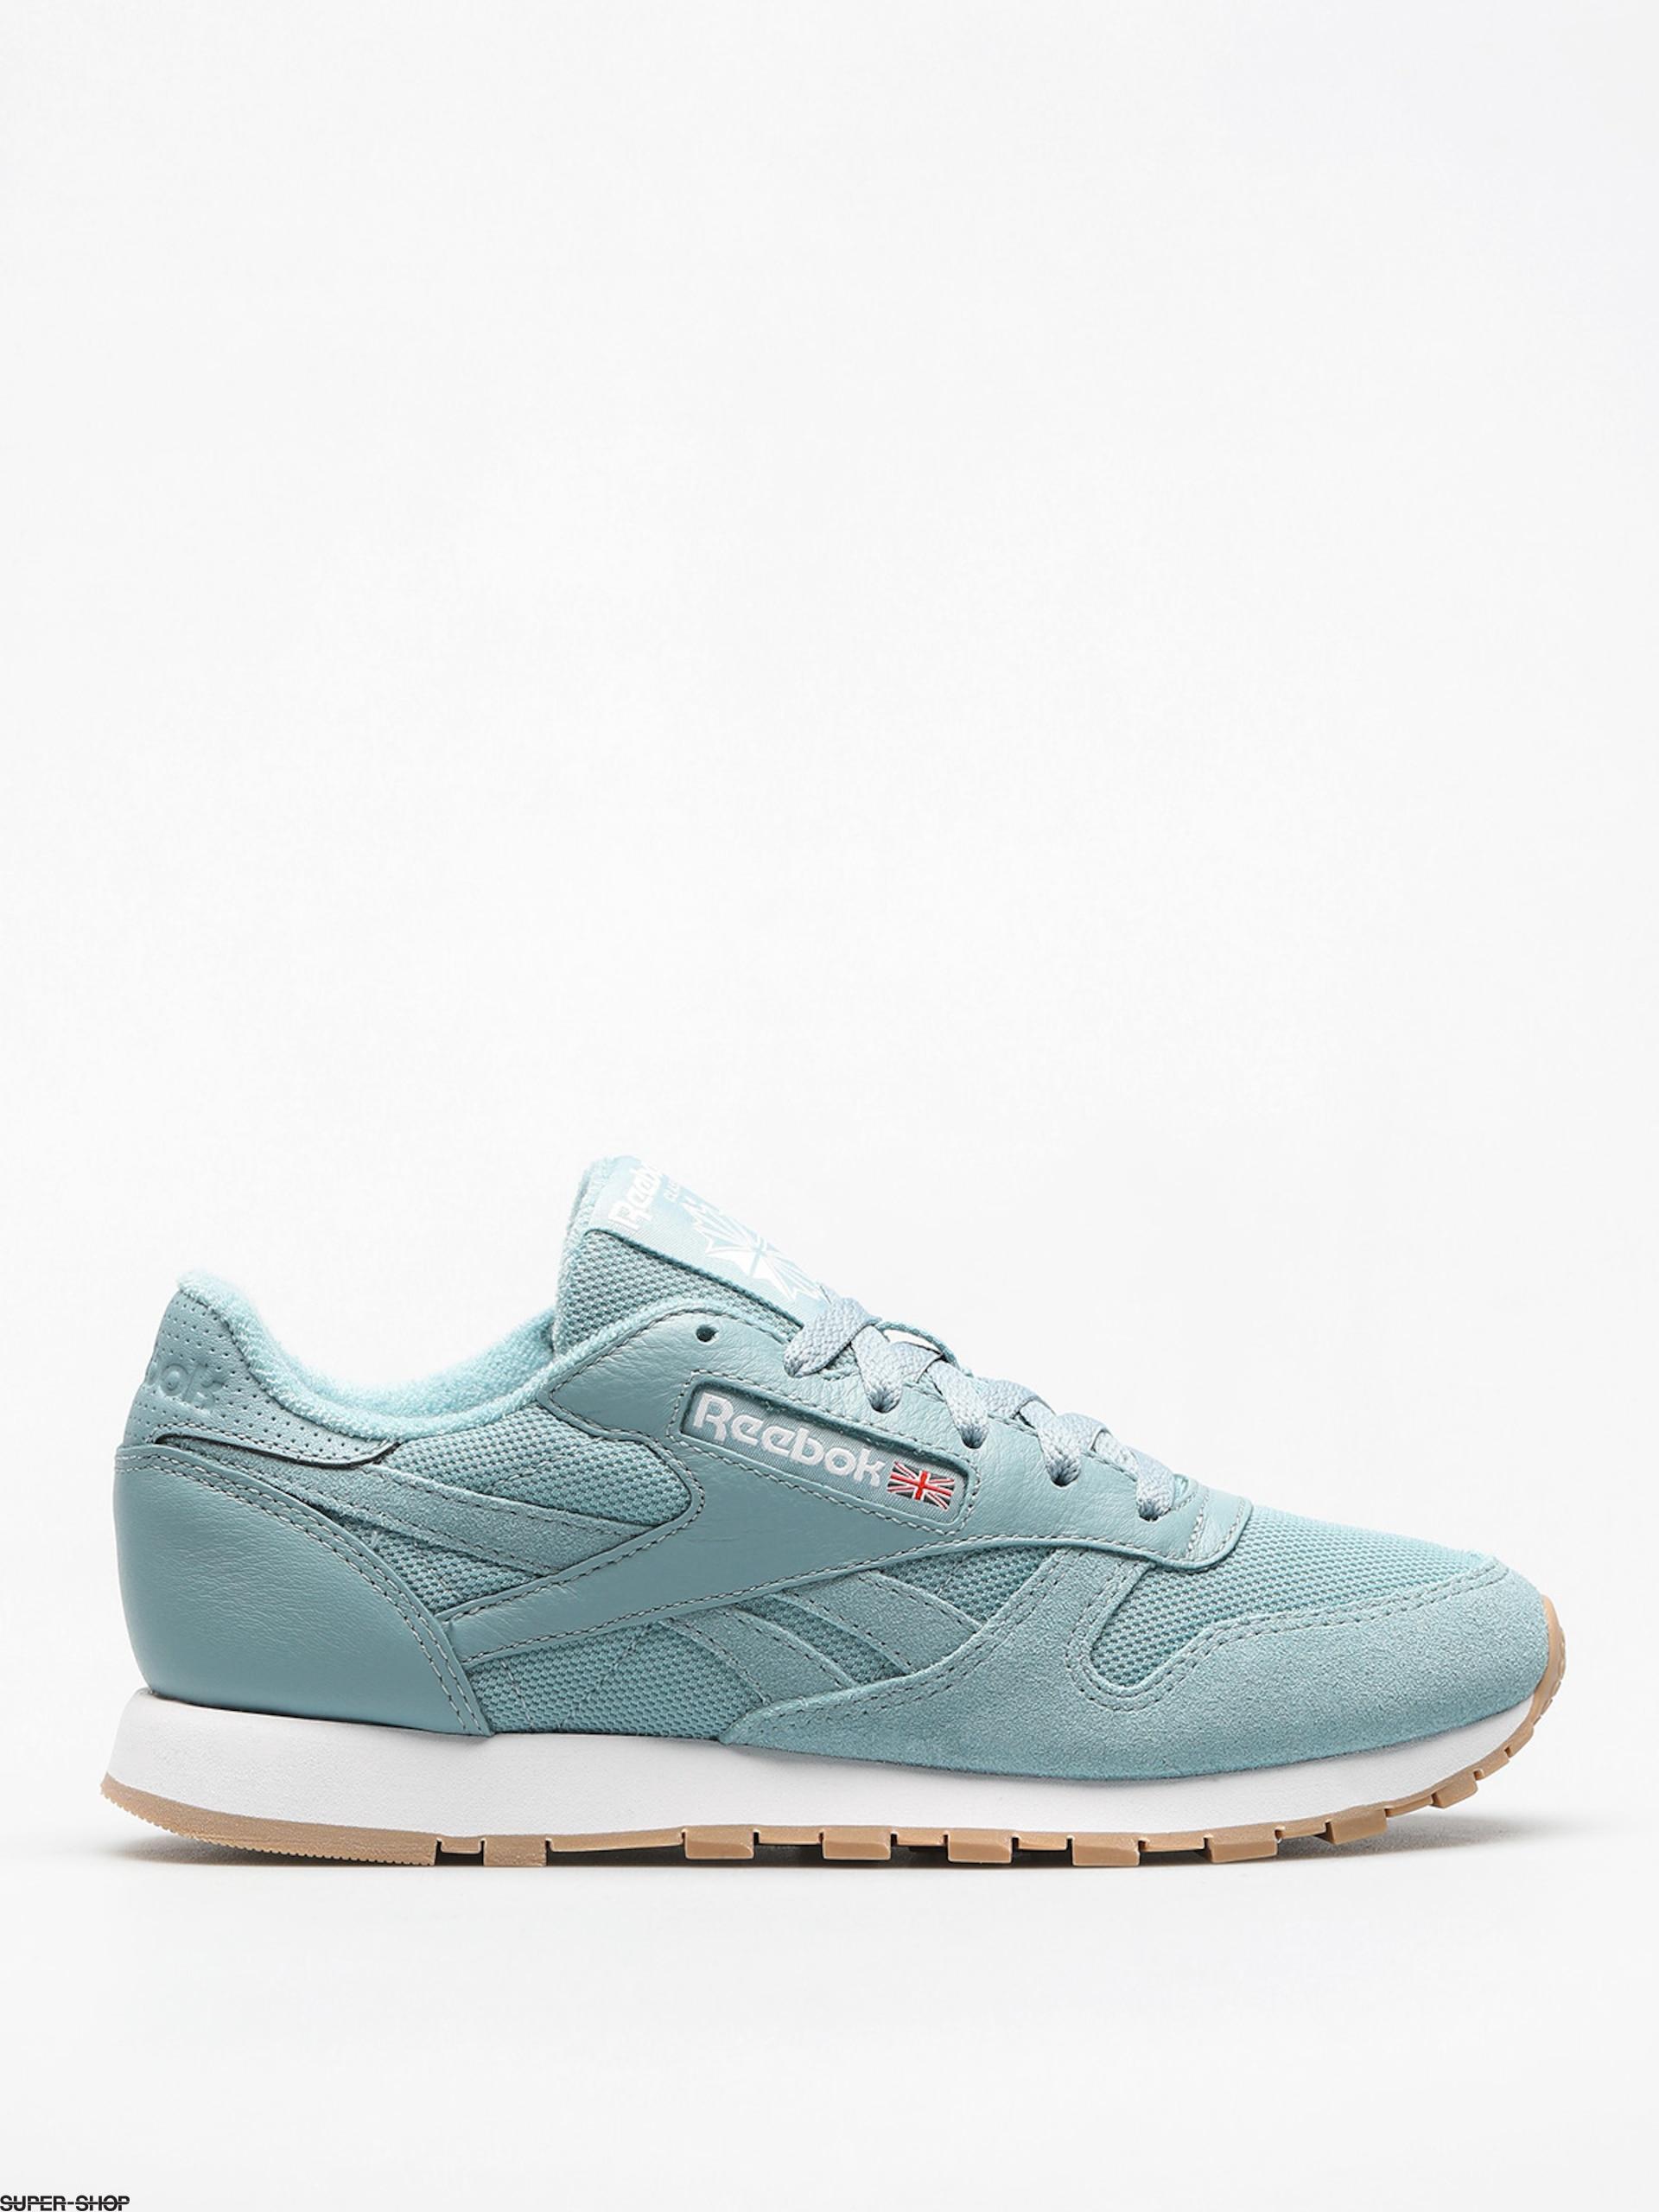 2c6a2e084d3 Reebok Shoes Cl Leather Estl Wmn (whisper teal white)